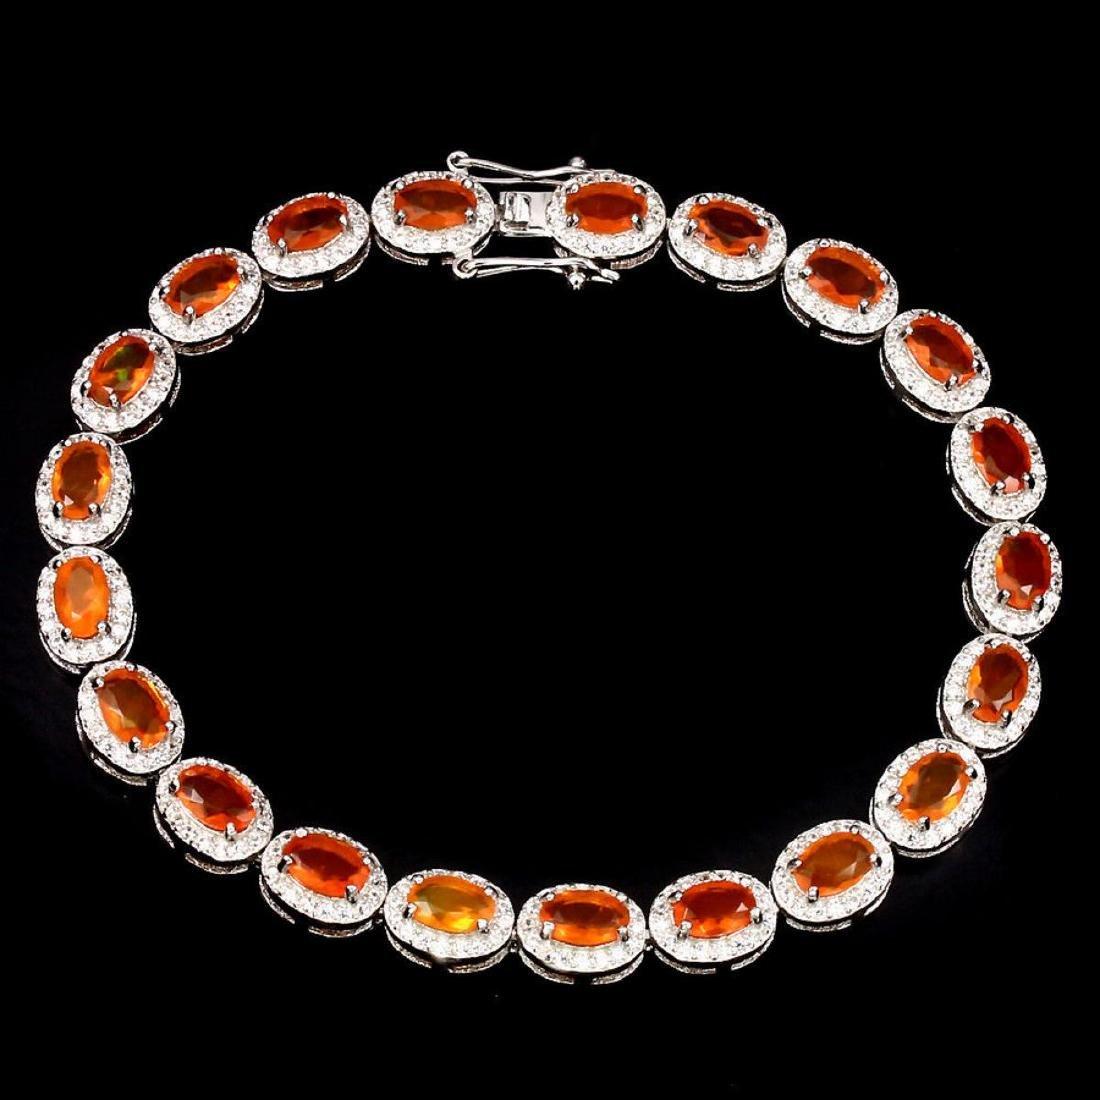 Natural Top Rich Orange Fire Opal Bracelet